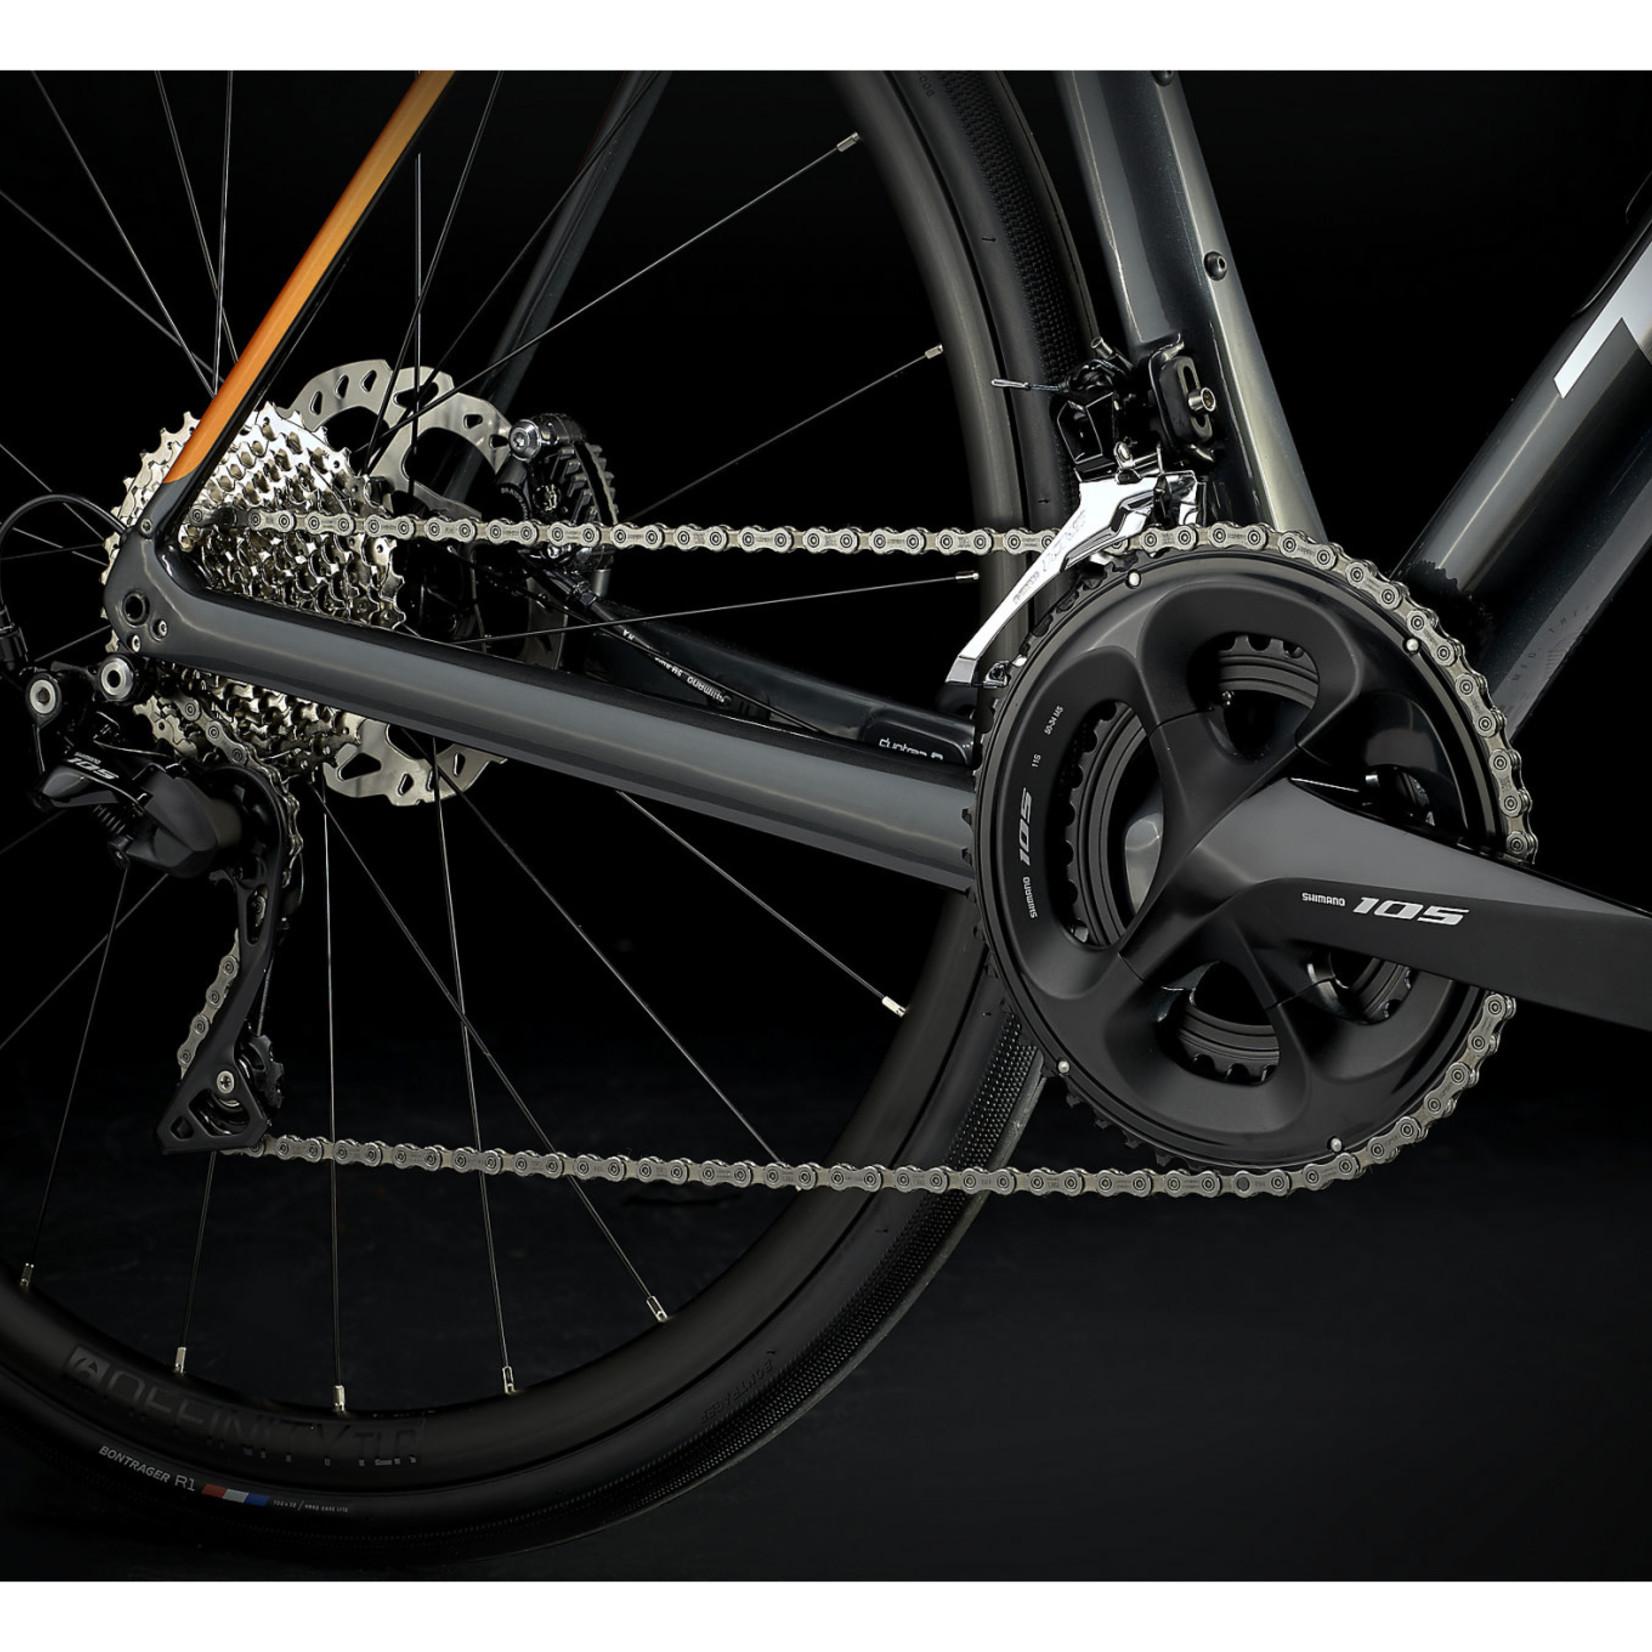 Trek Domane SL 5 Disc 54 Shimano 105 11V Lithium Gray / Factory Orange 2021 Road Bike